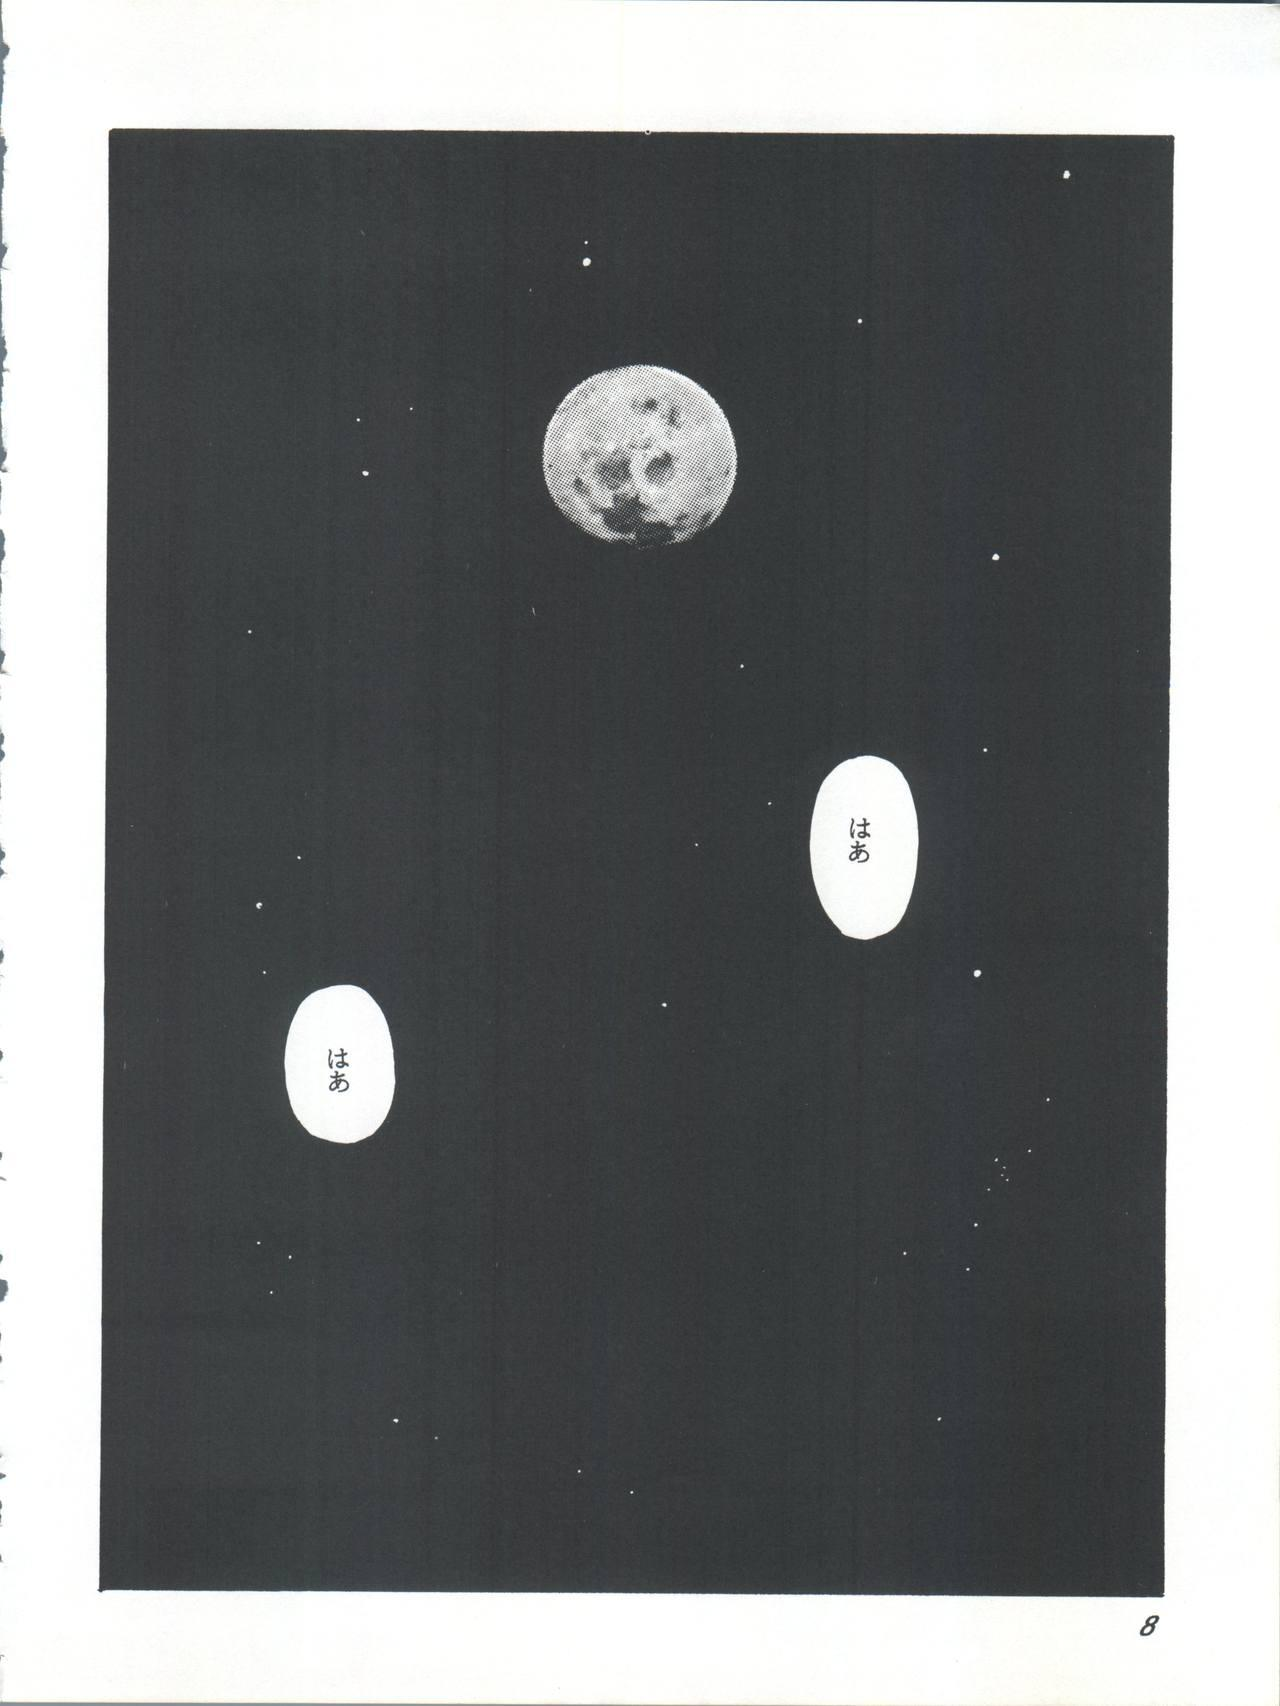 Card Captor Sakura Act 3 Green Version 7